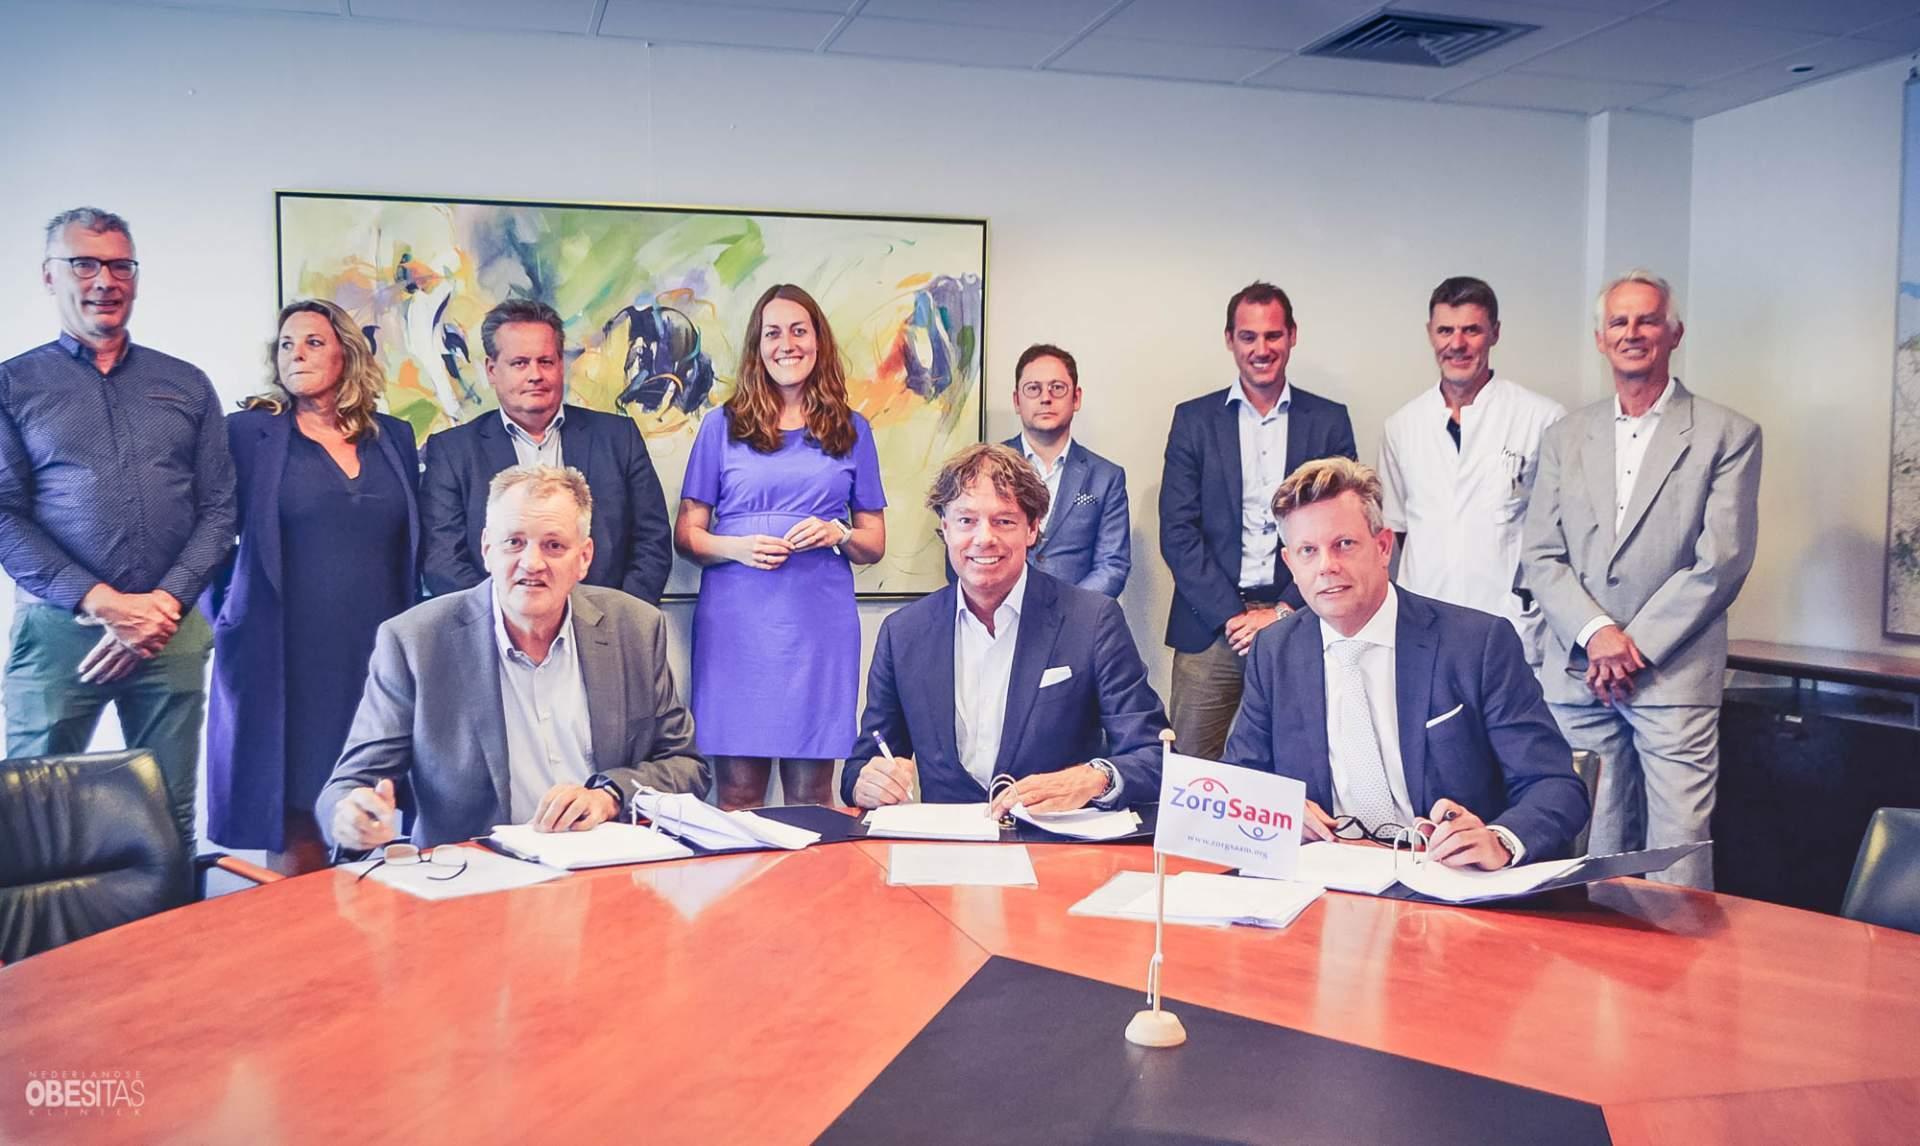 Nederlandse Obesitas Kliniek start samenwerking met Bariatrisch Centrum ZorgSaam in Terneuzen